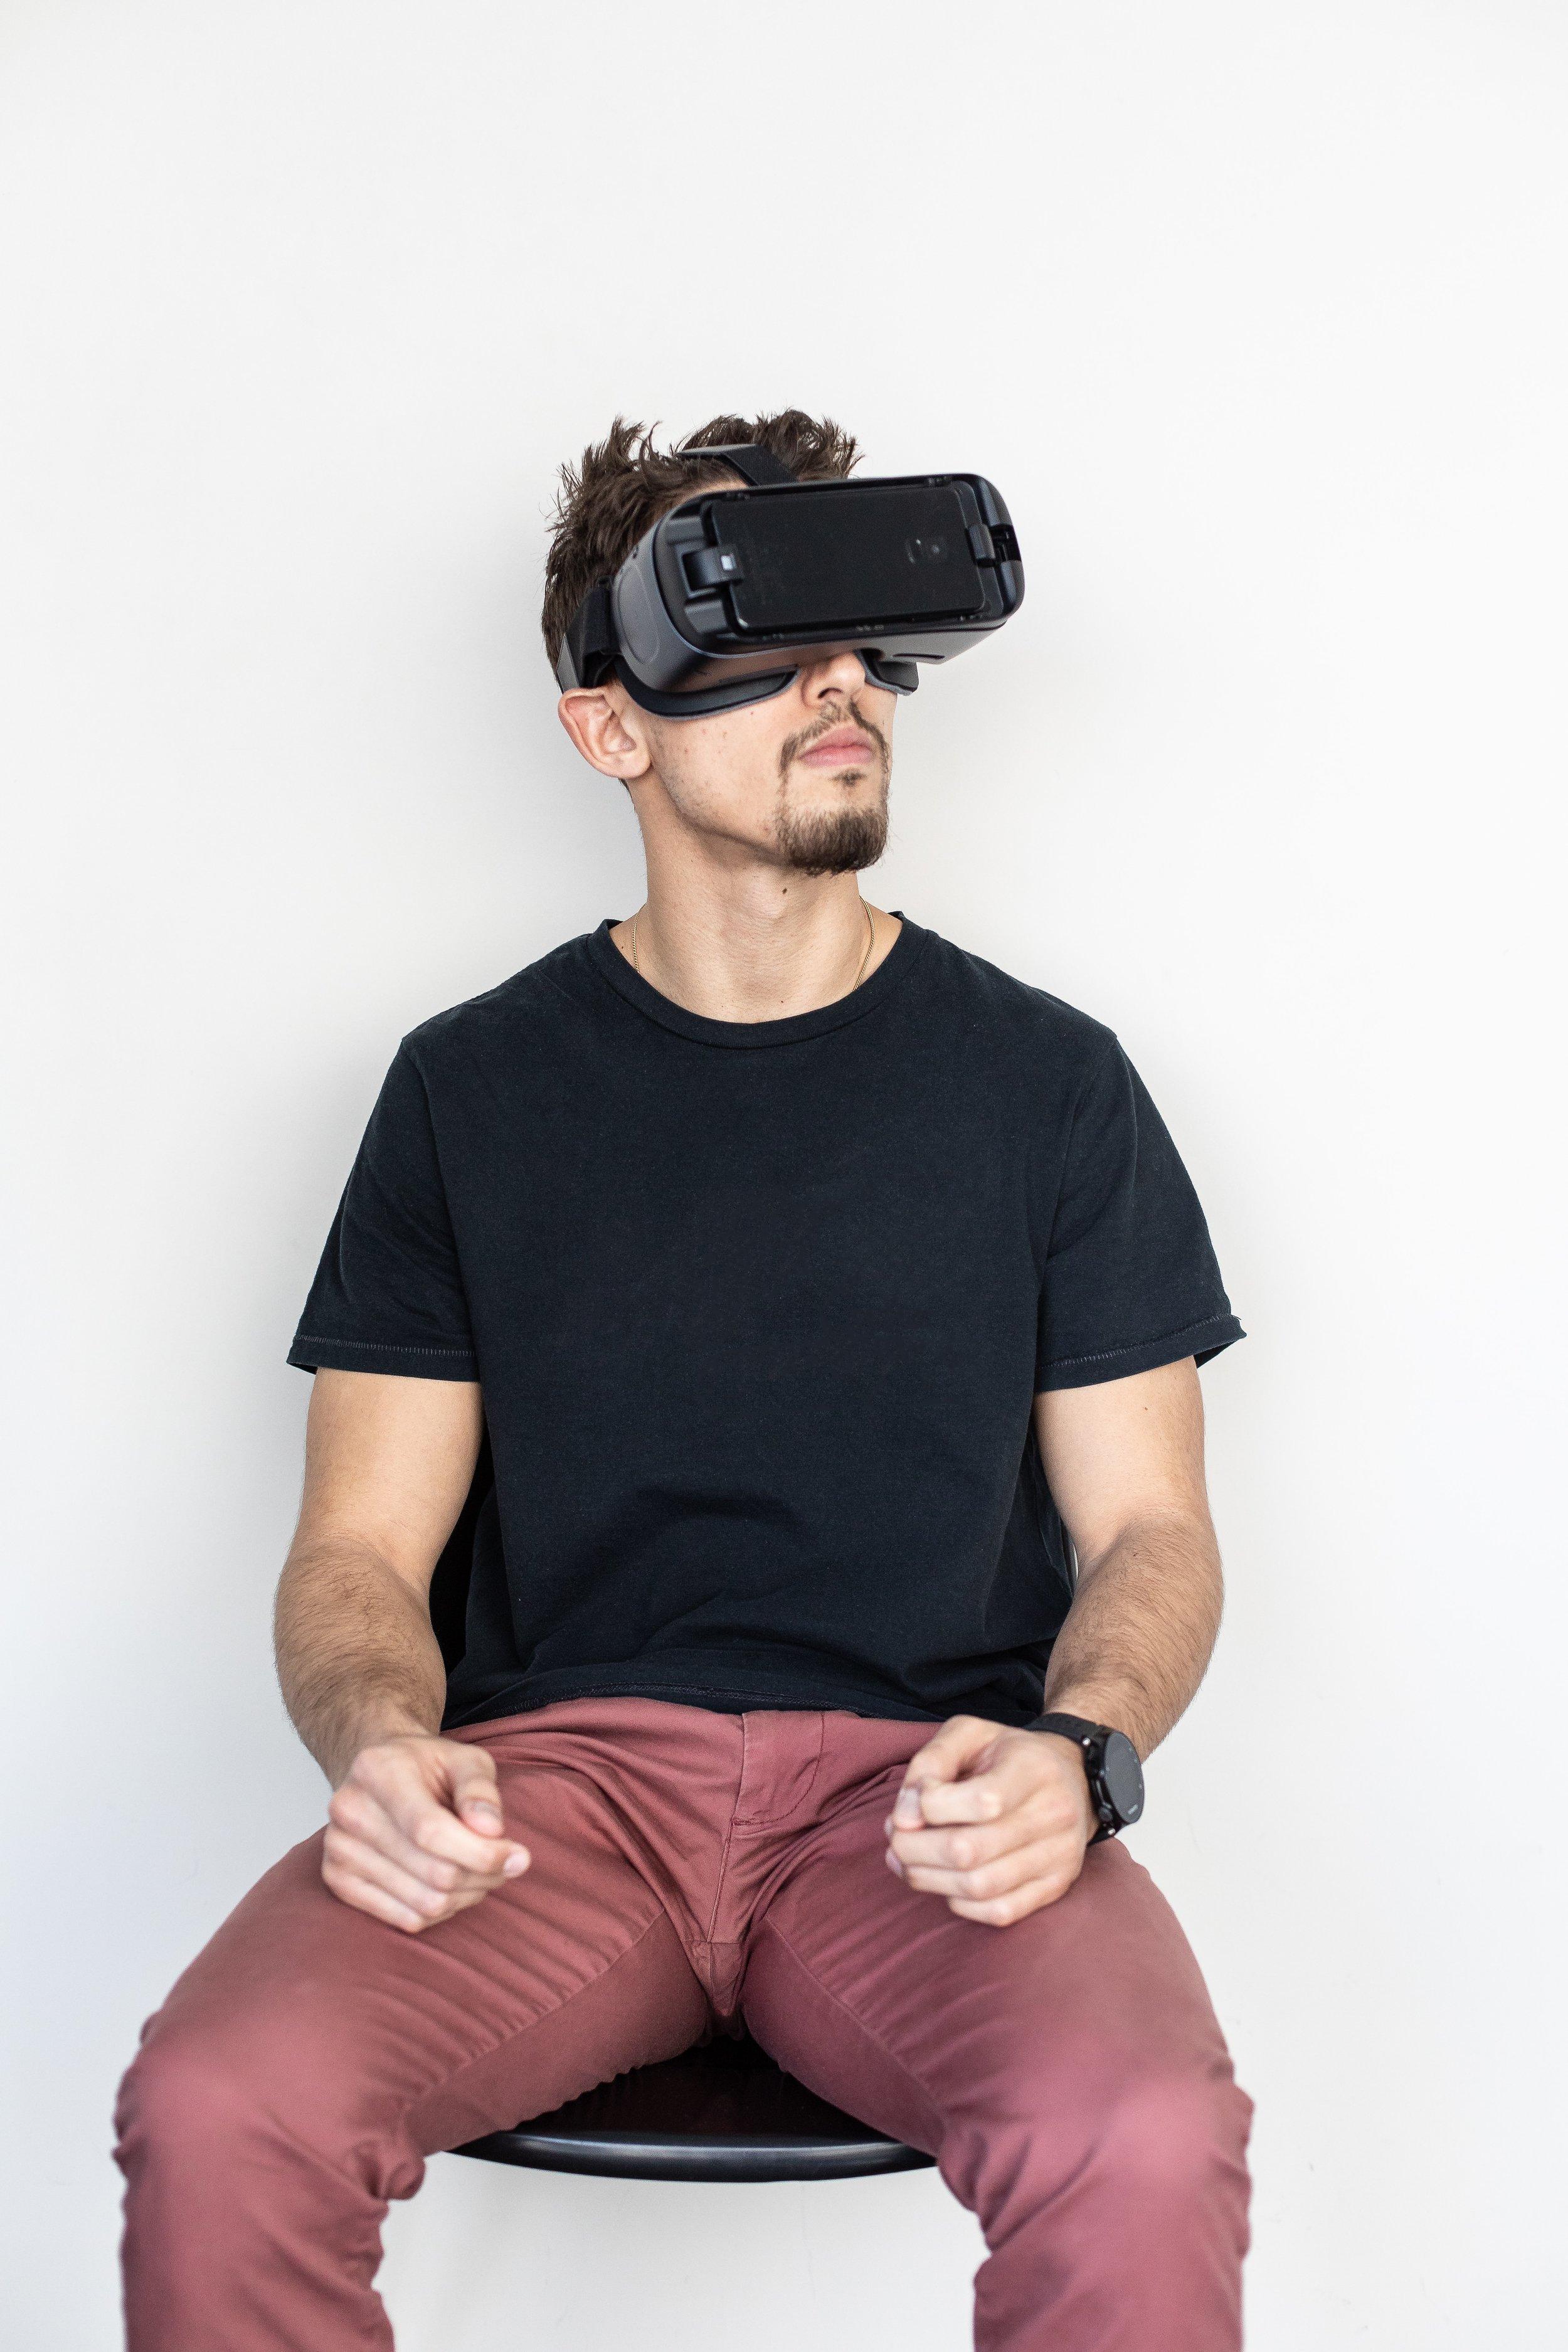 VR for Neck Pain